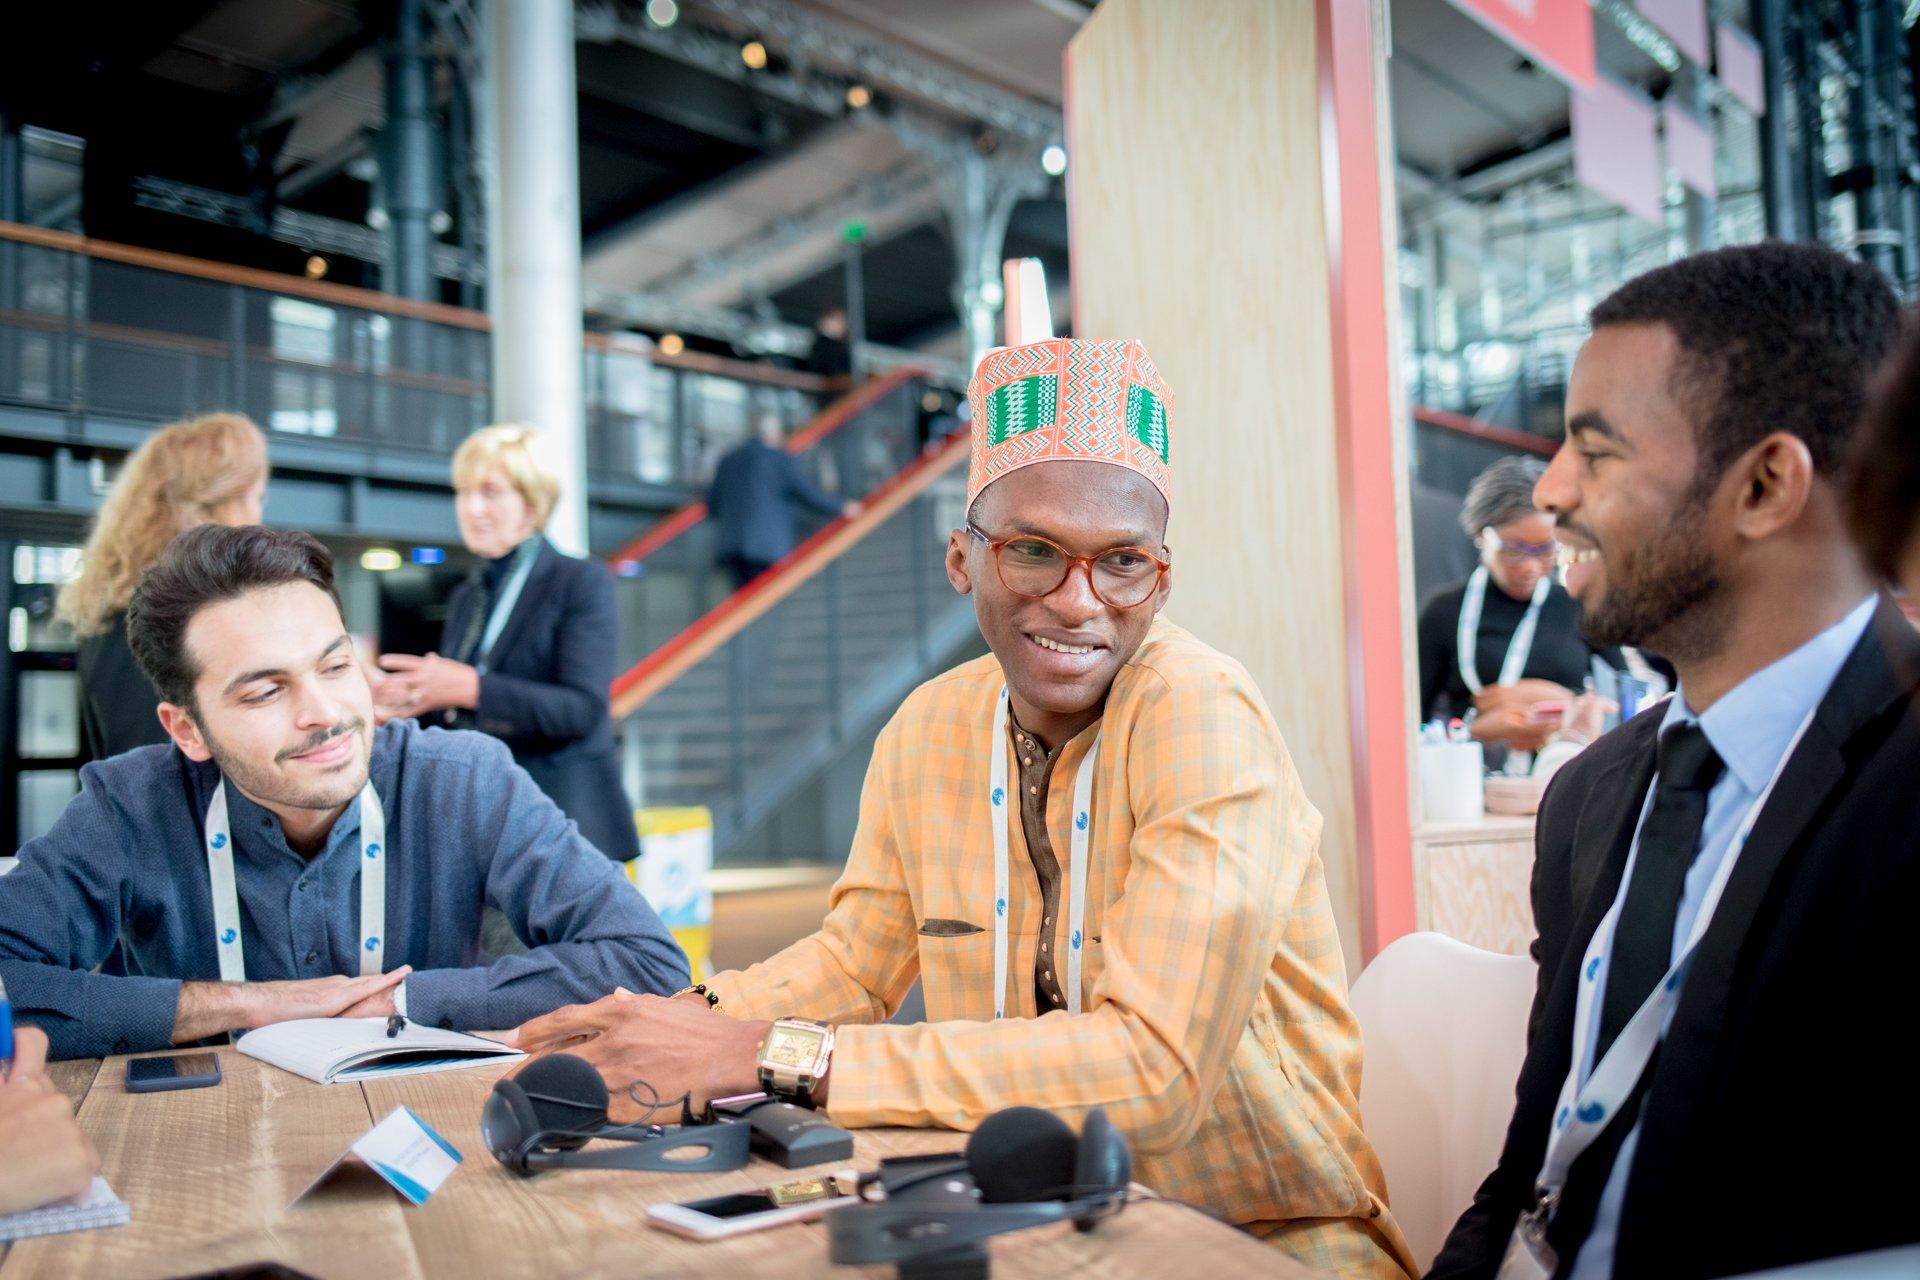 Group braindate at the Paris Peace Forum